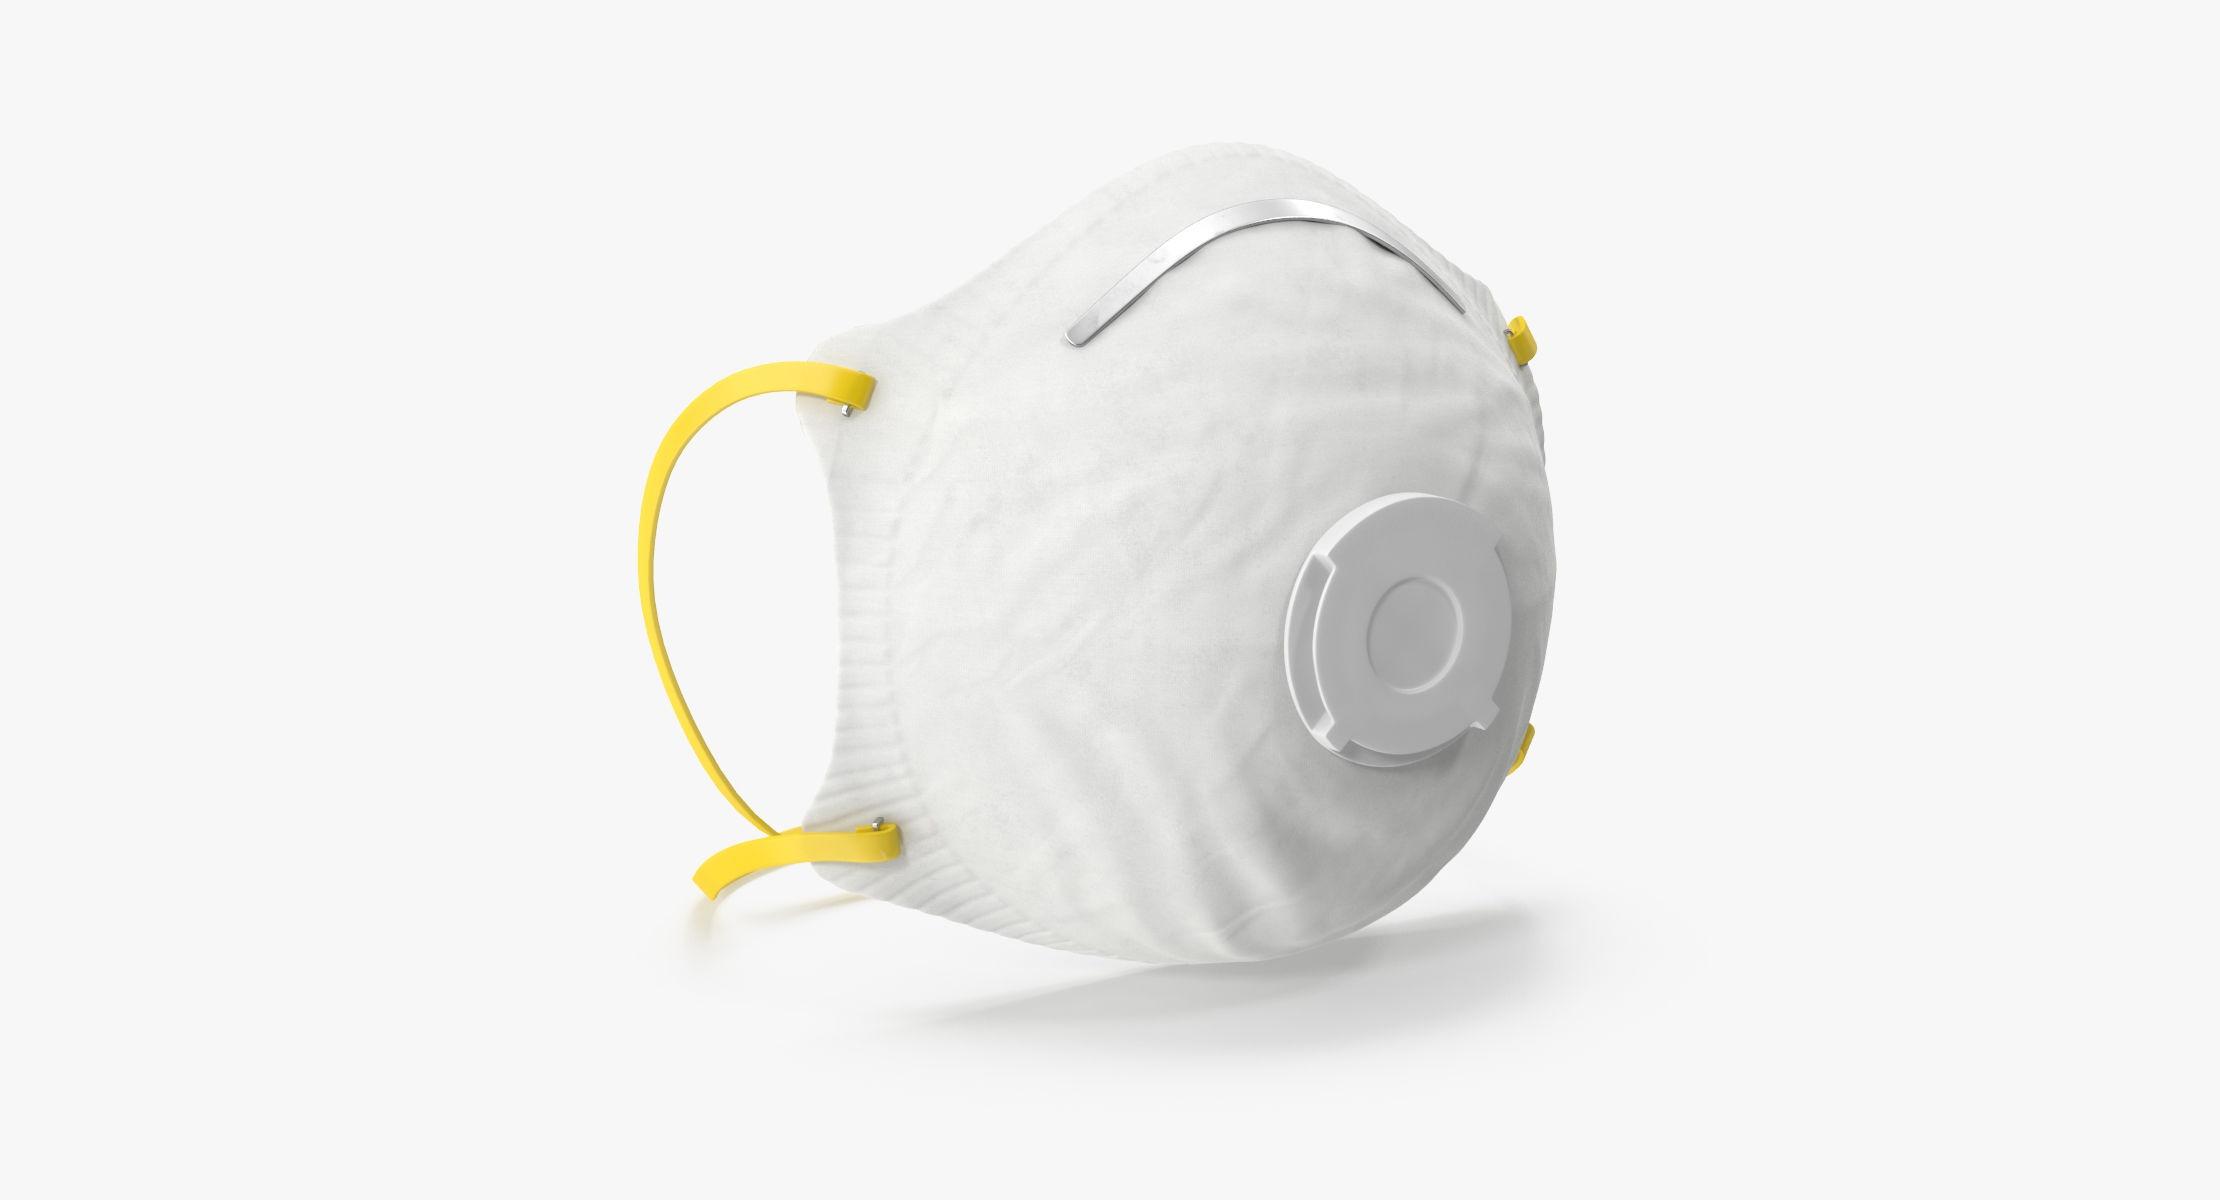 respiration mask